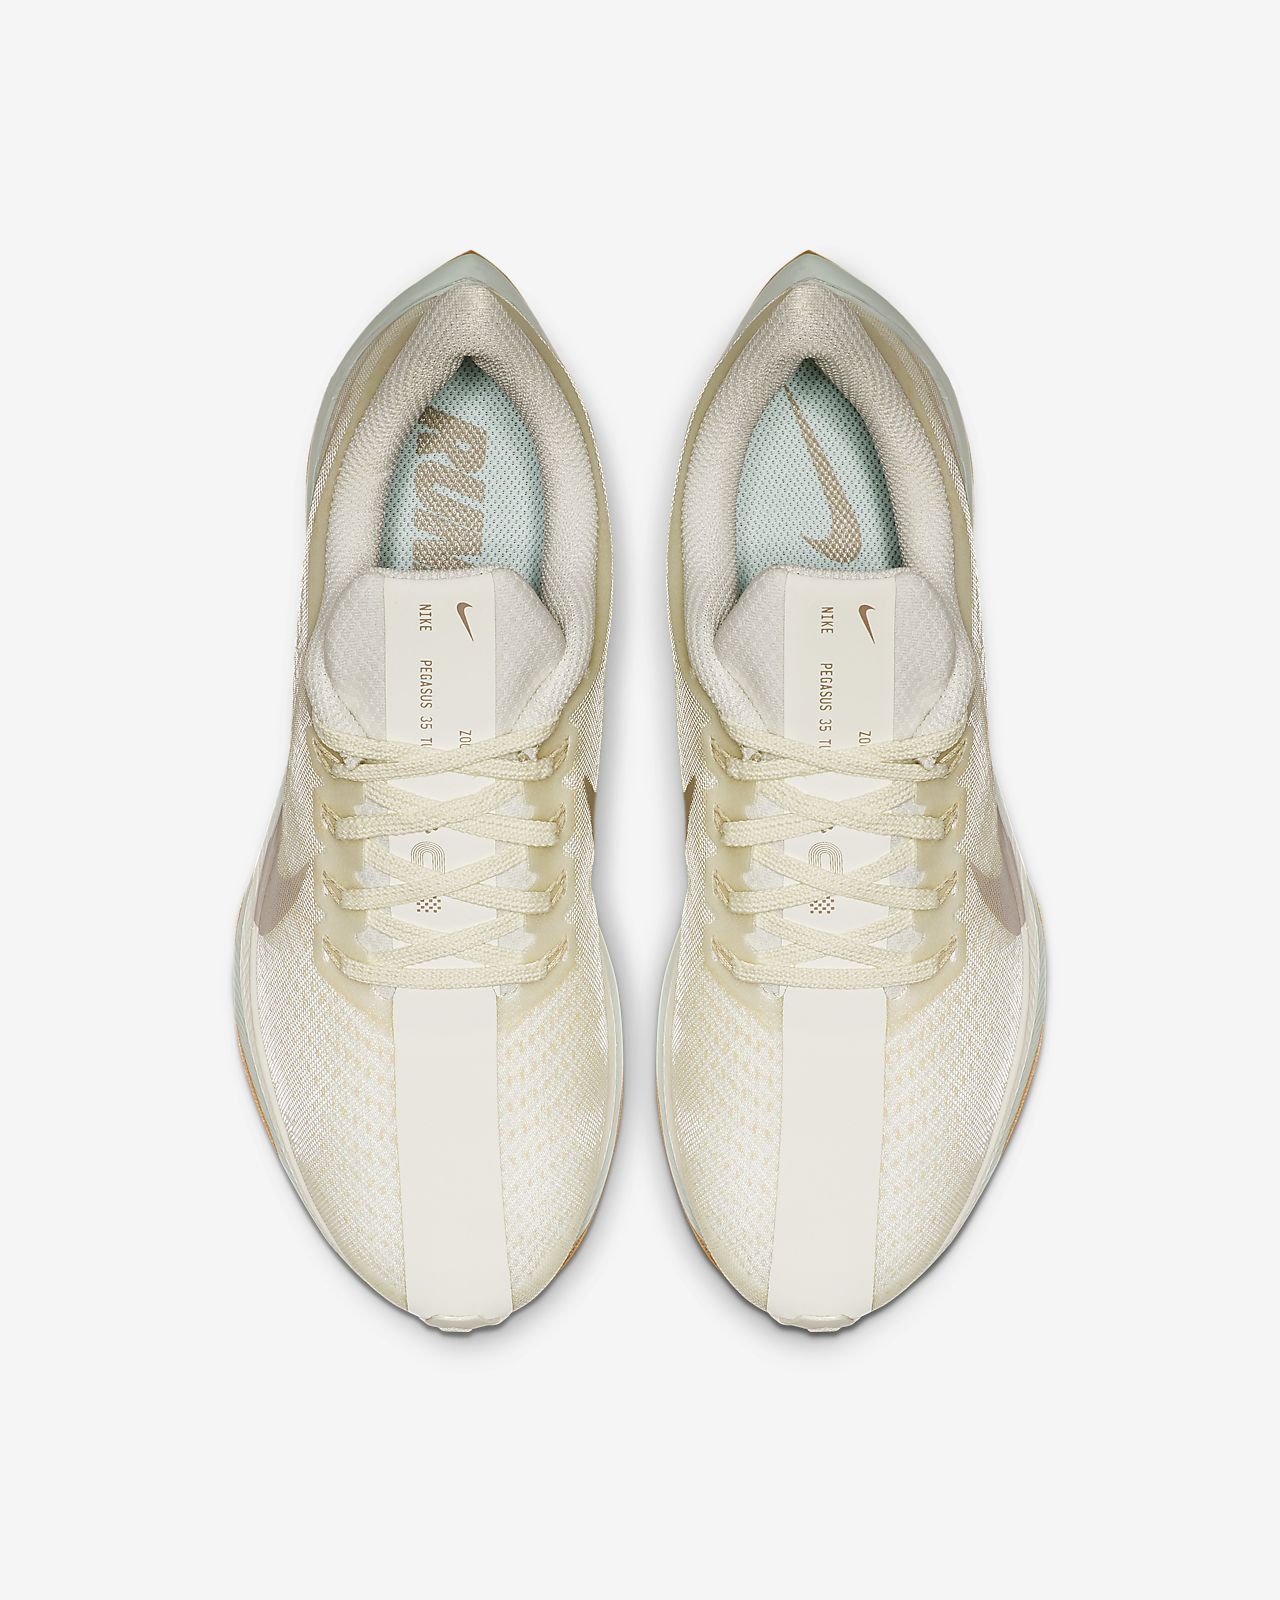 6521e5fa30 Nike Zoom Pegasus Turbo Women's Running Shoe. Nike.com ID